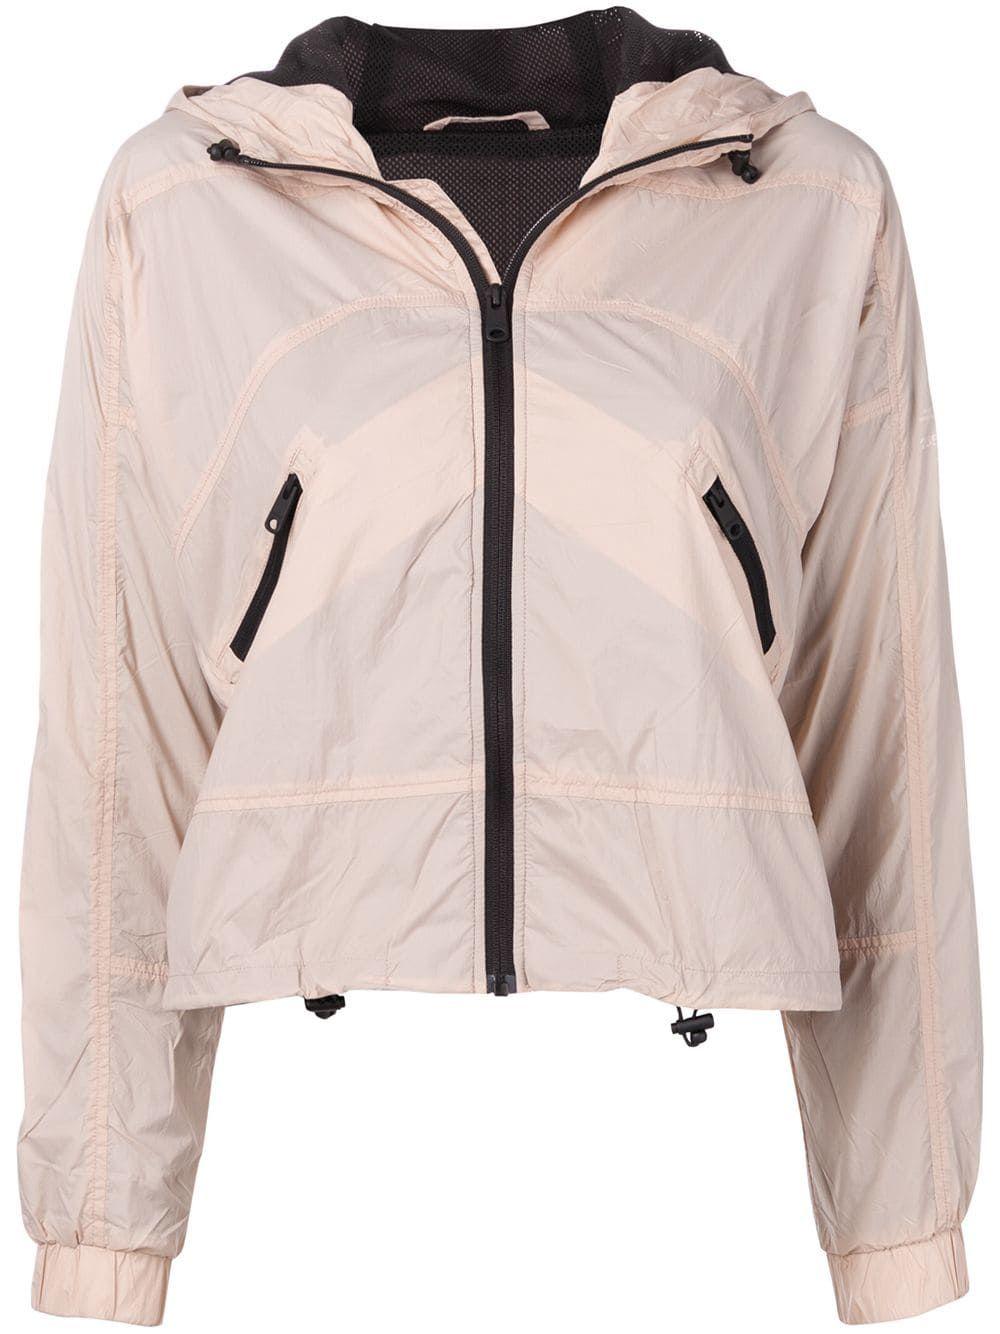 Ecoalf Lightweight Jacket Pink Lightweight Jacket Jackets Menswear